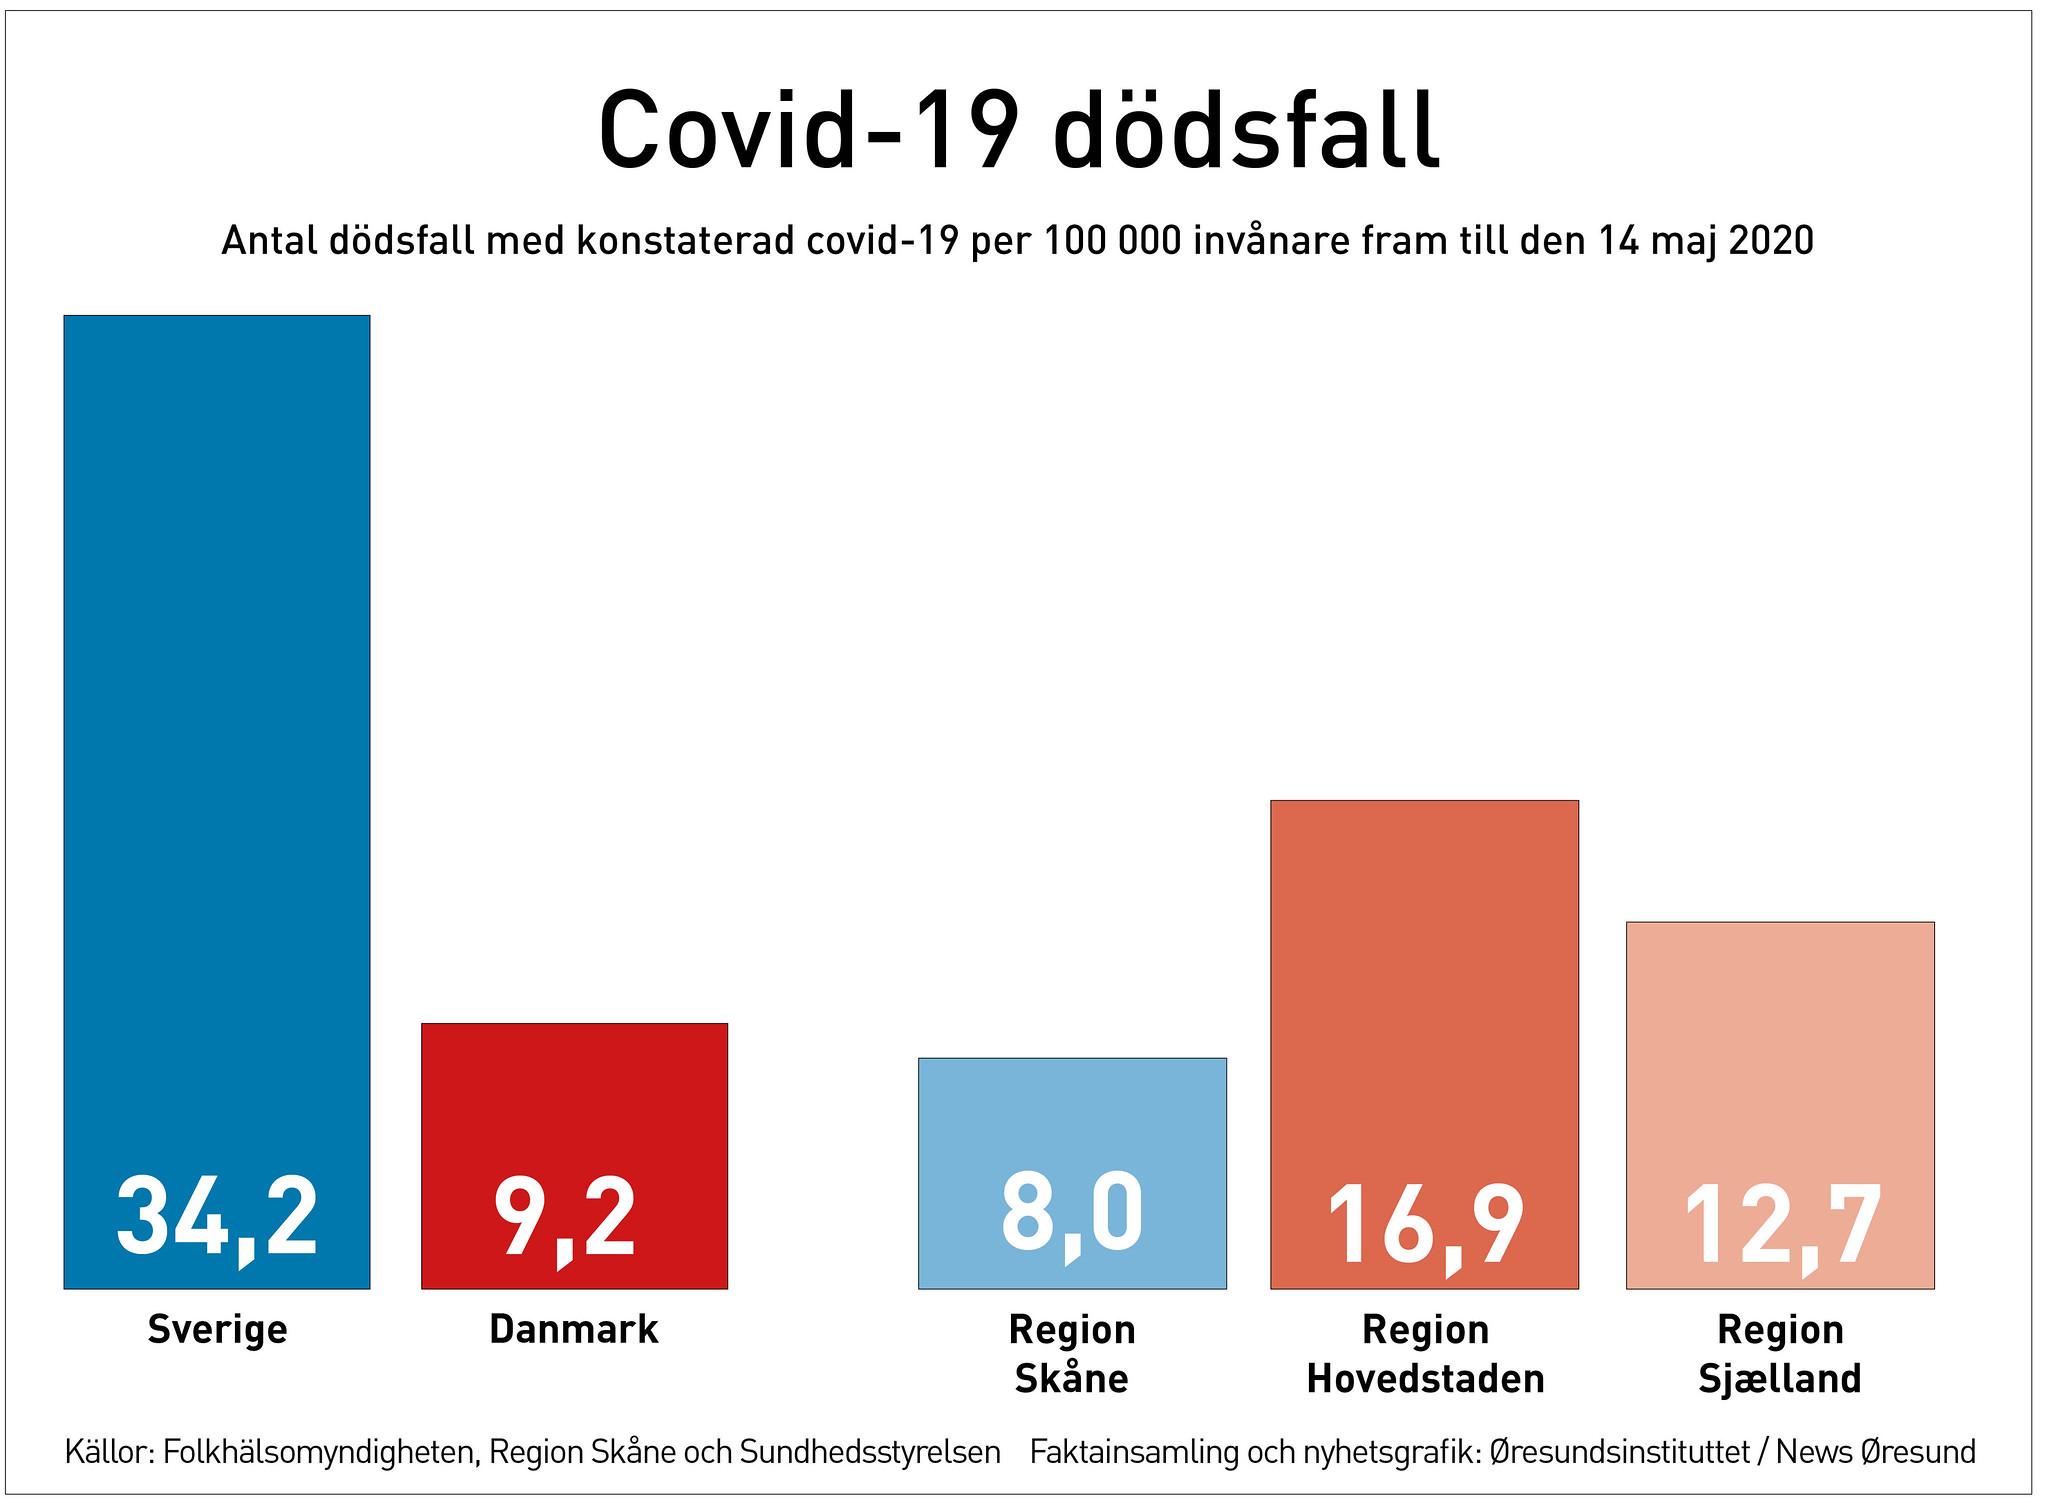 Covid 19 Allt Farre I Intensivvard I Danmark Men Hittills Fler Dodsfall Pa Sjalland An I Skane News Oresund Sverige